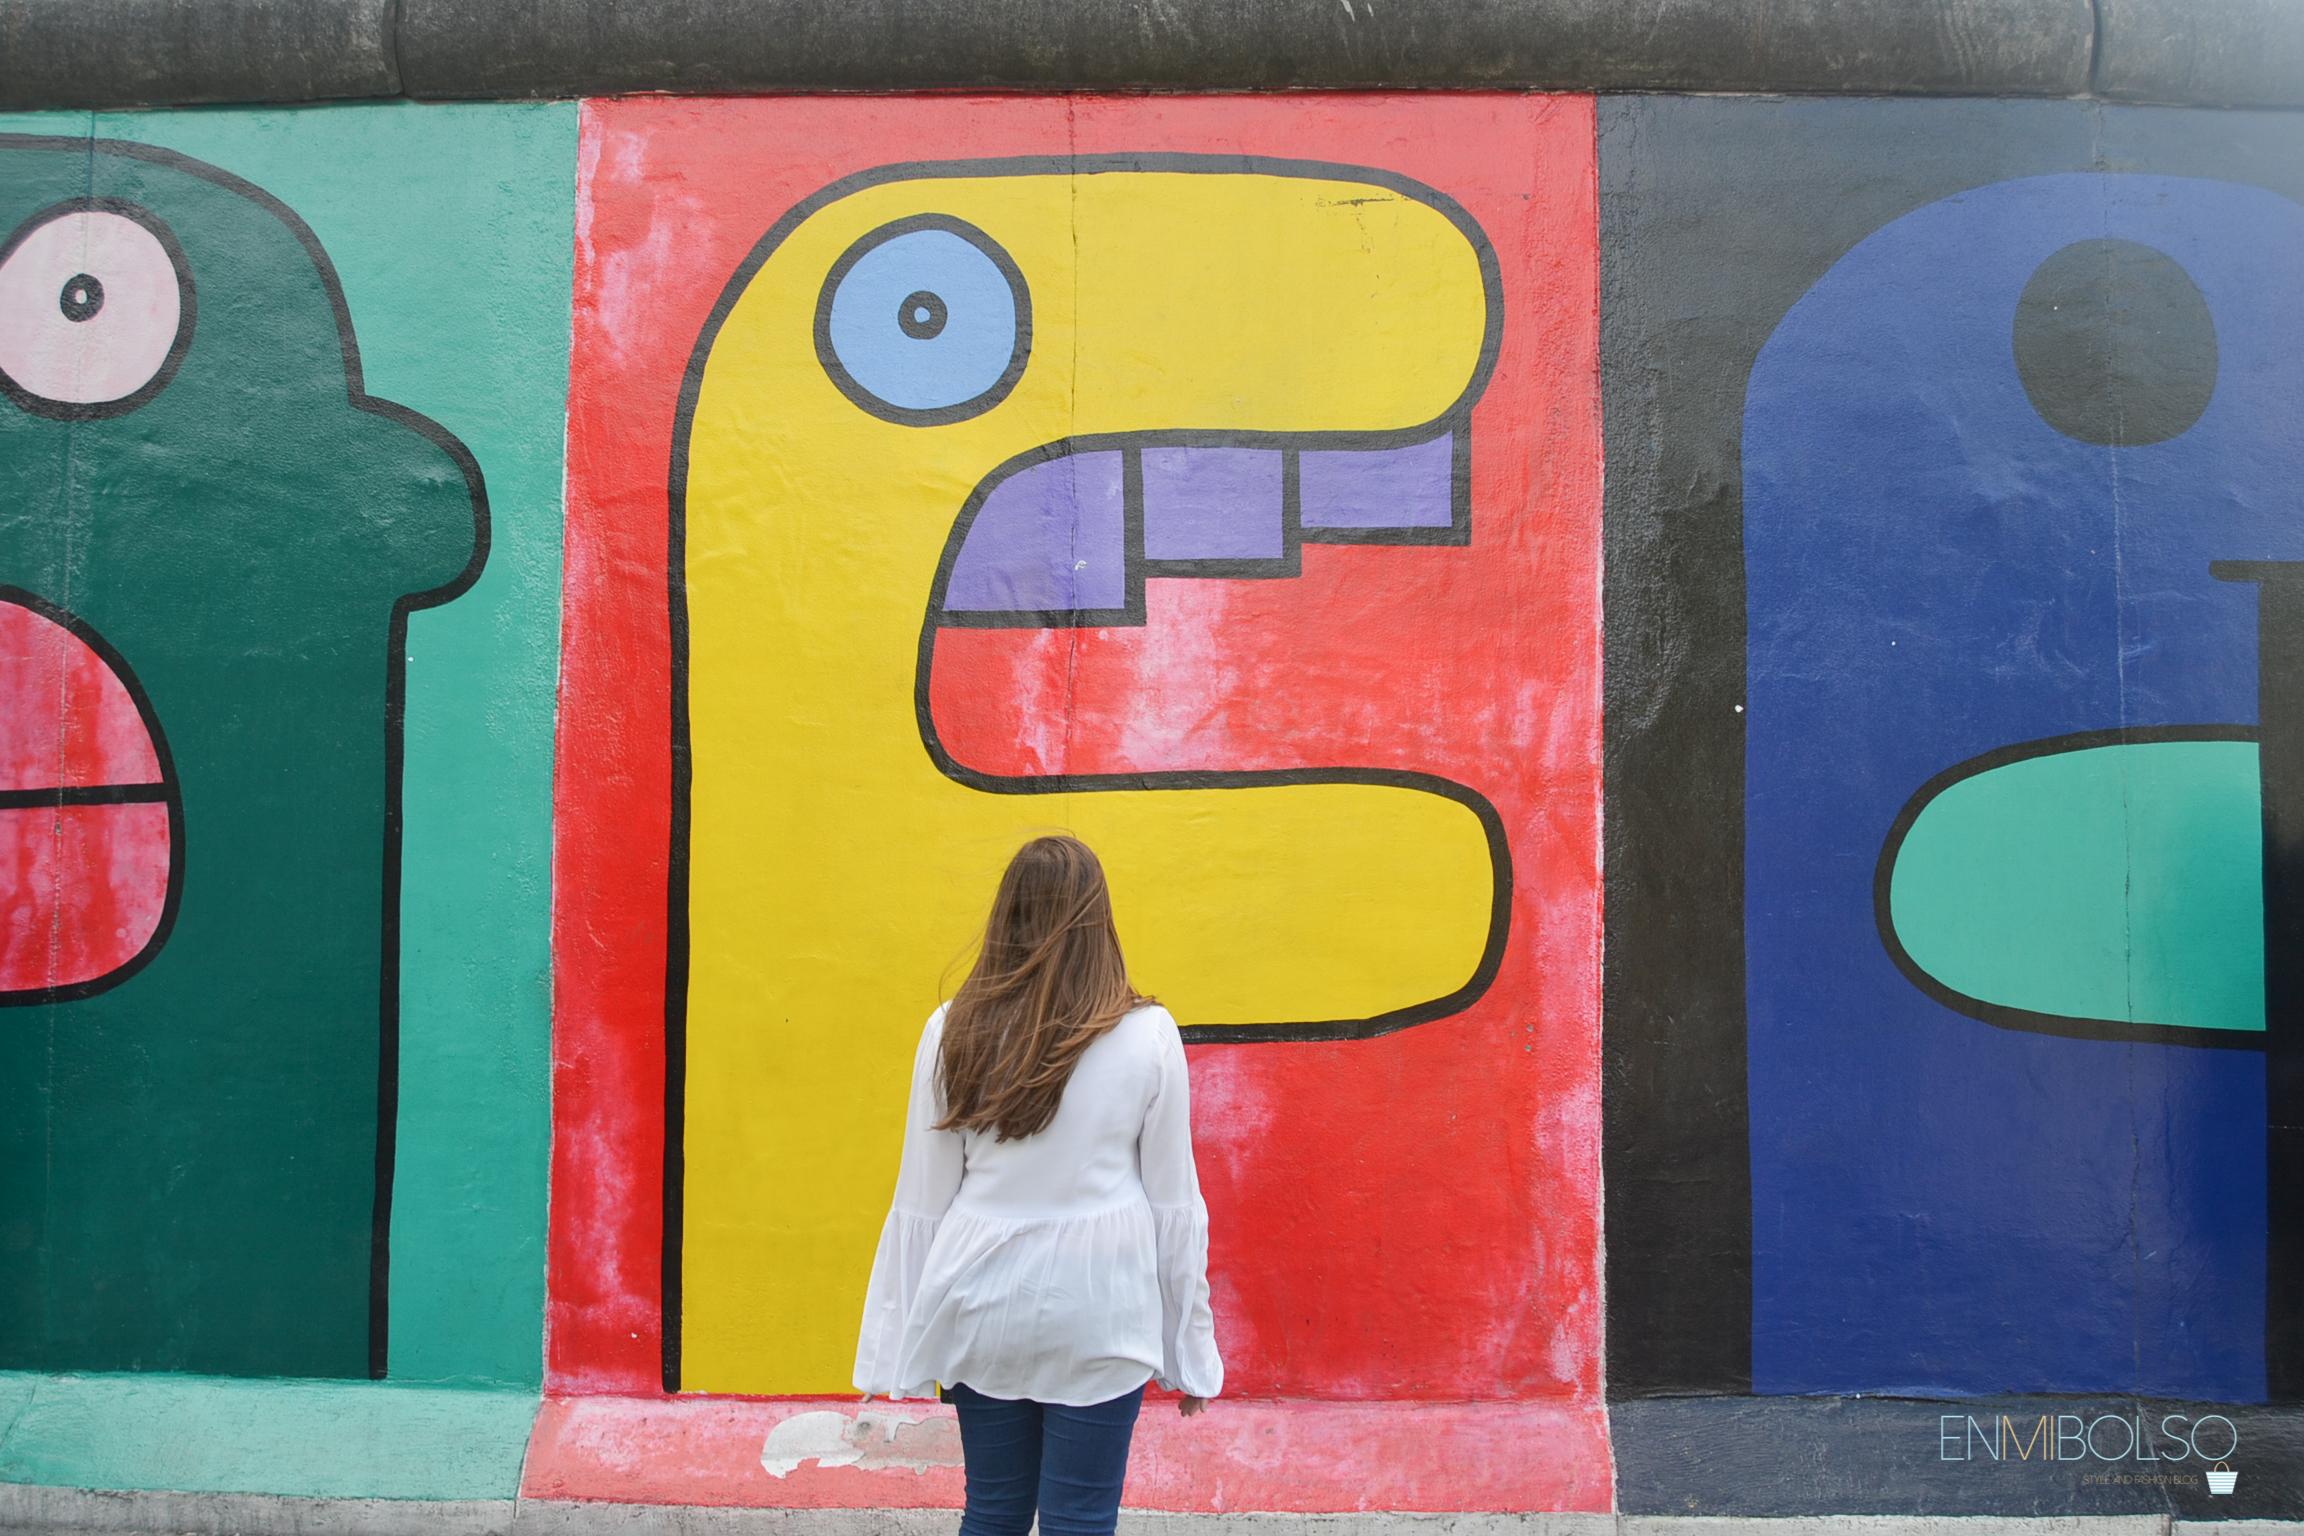 Muro de Berlin-east side gallery-enmibolso